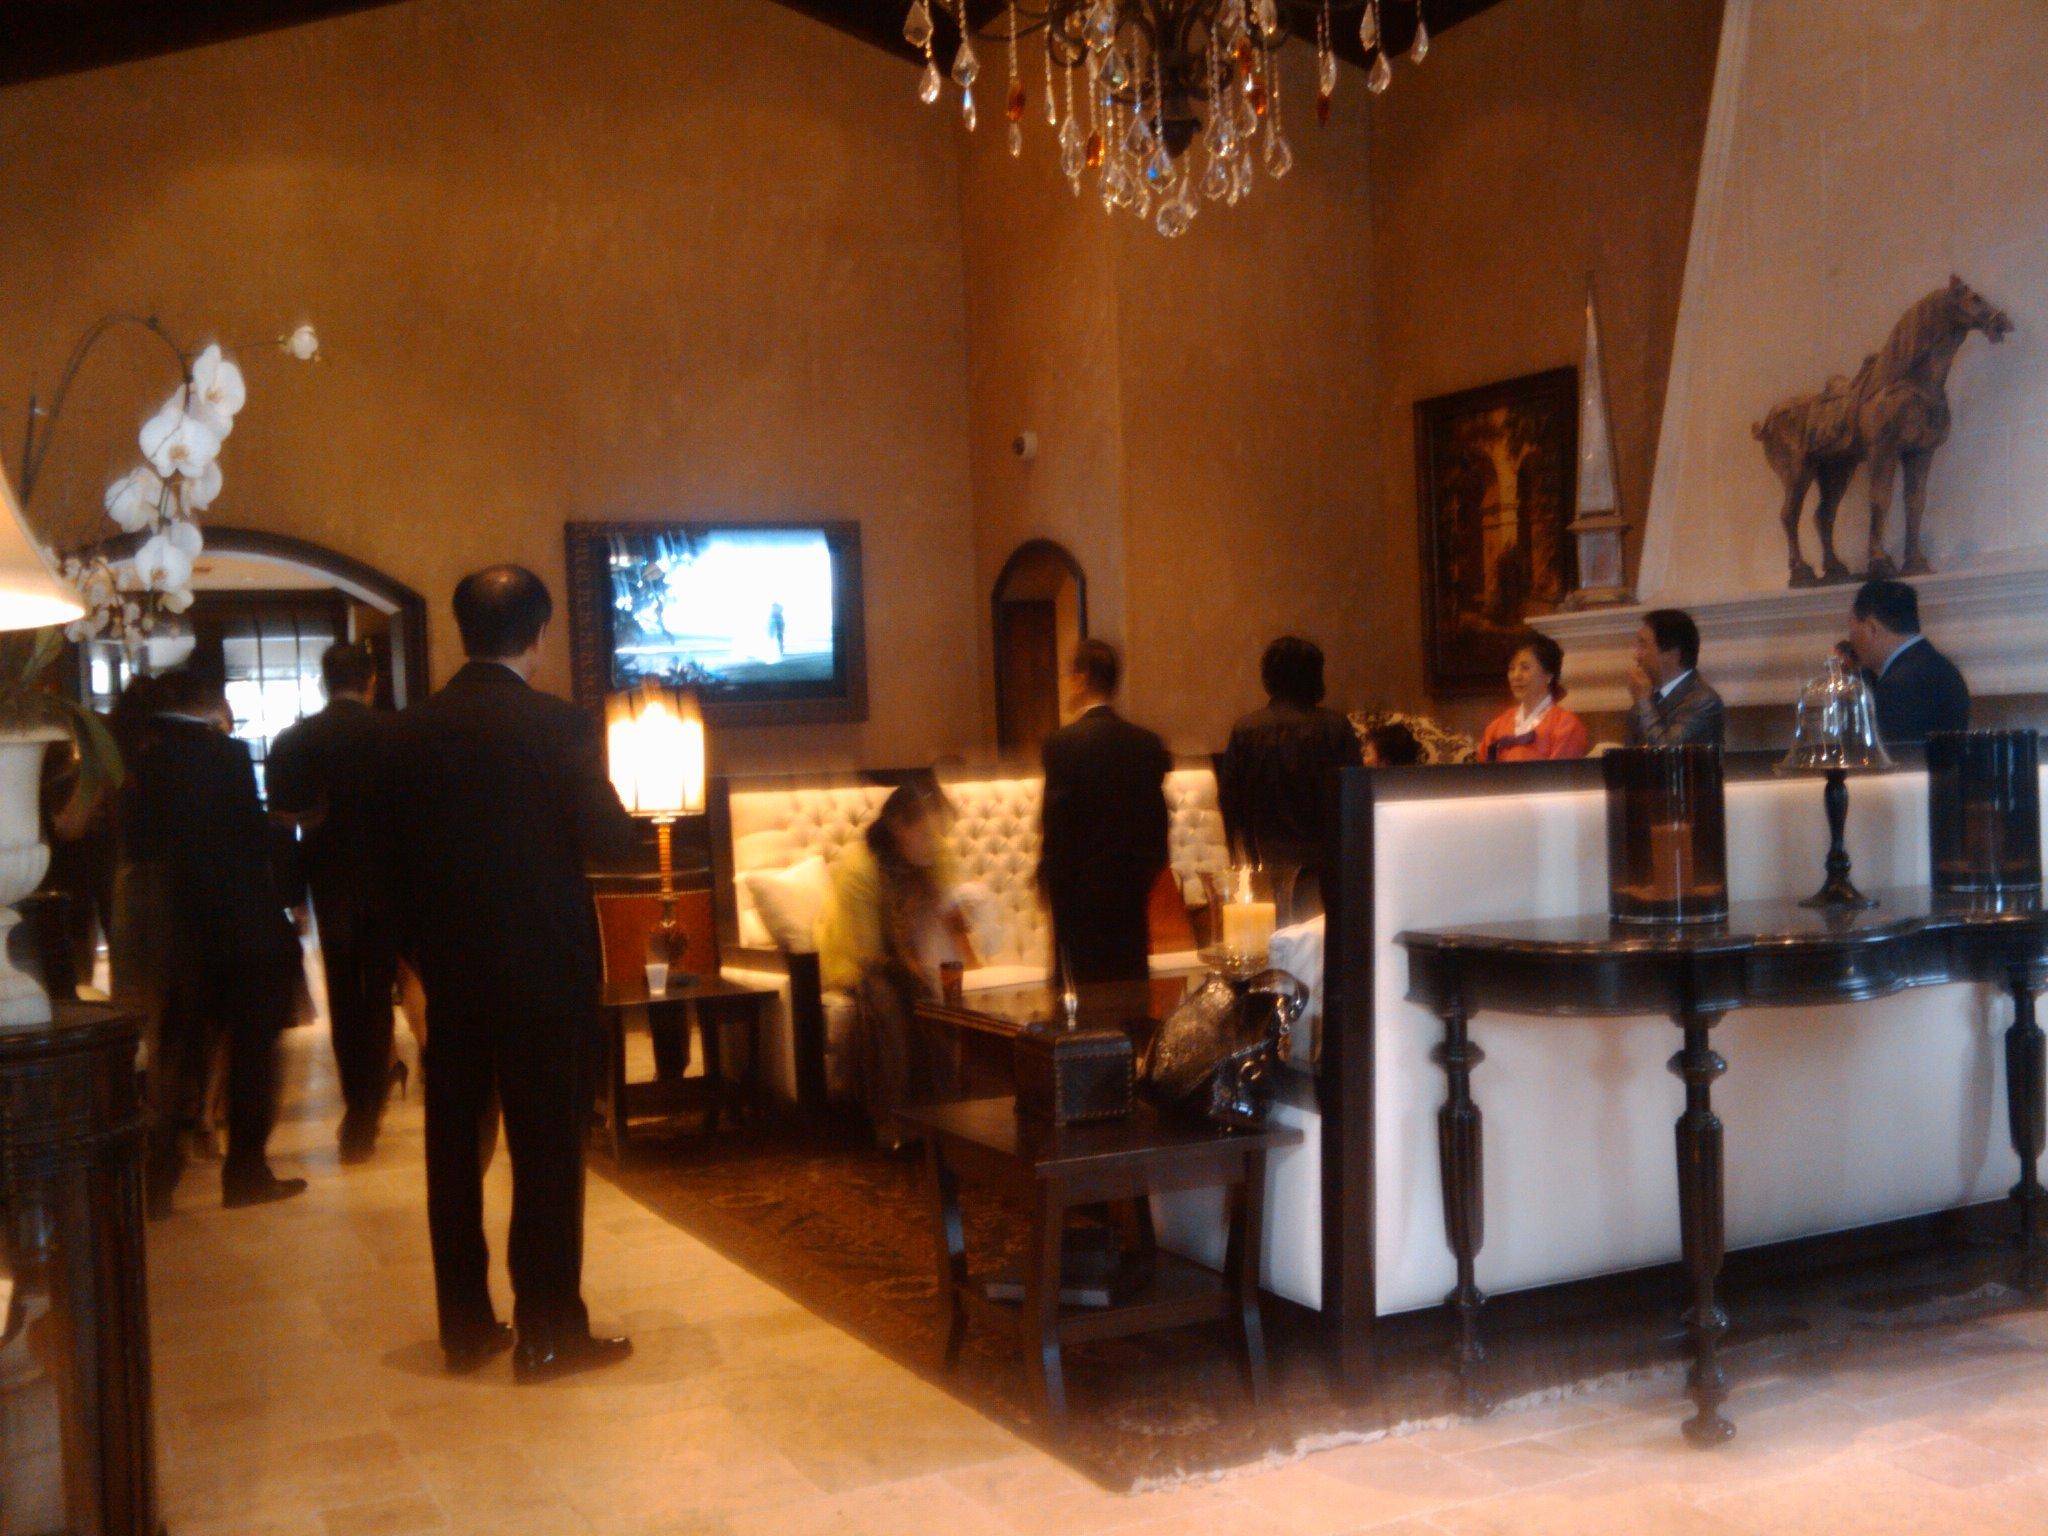 Hotel, Lobby, Inn, Westlake, Village